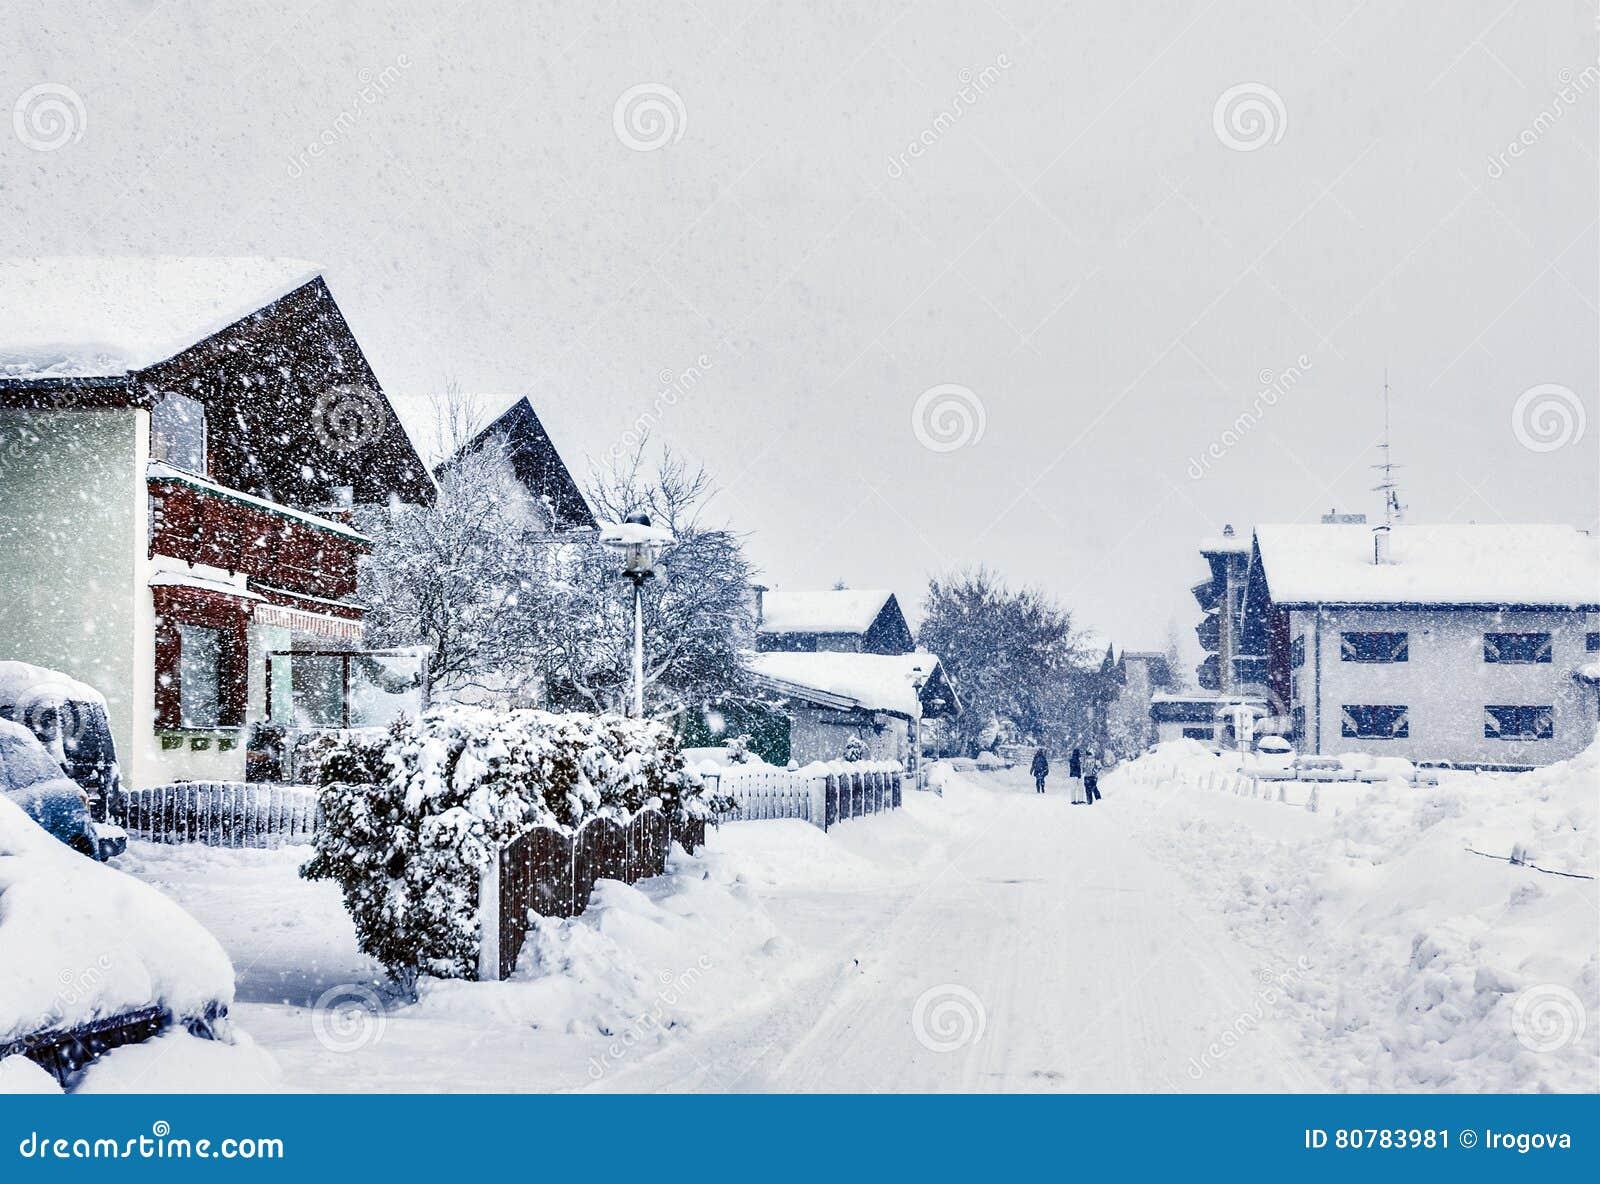 Kirchberg i Tirol, vinter, tungt snöfall